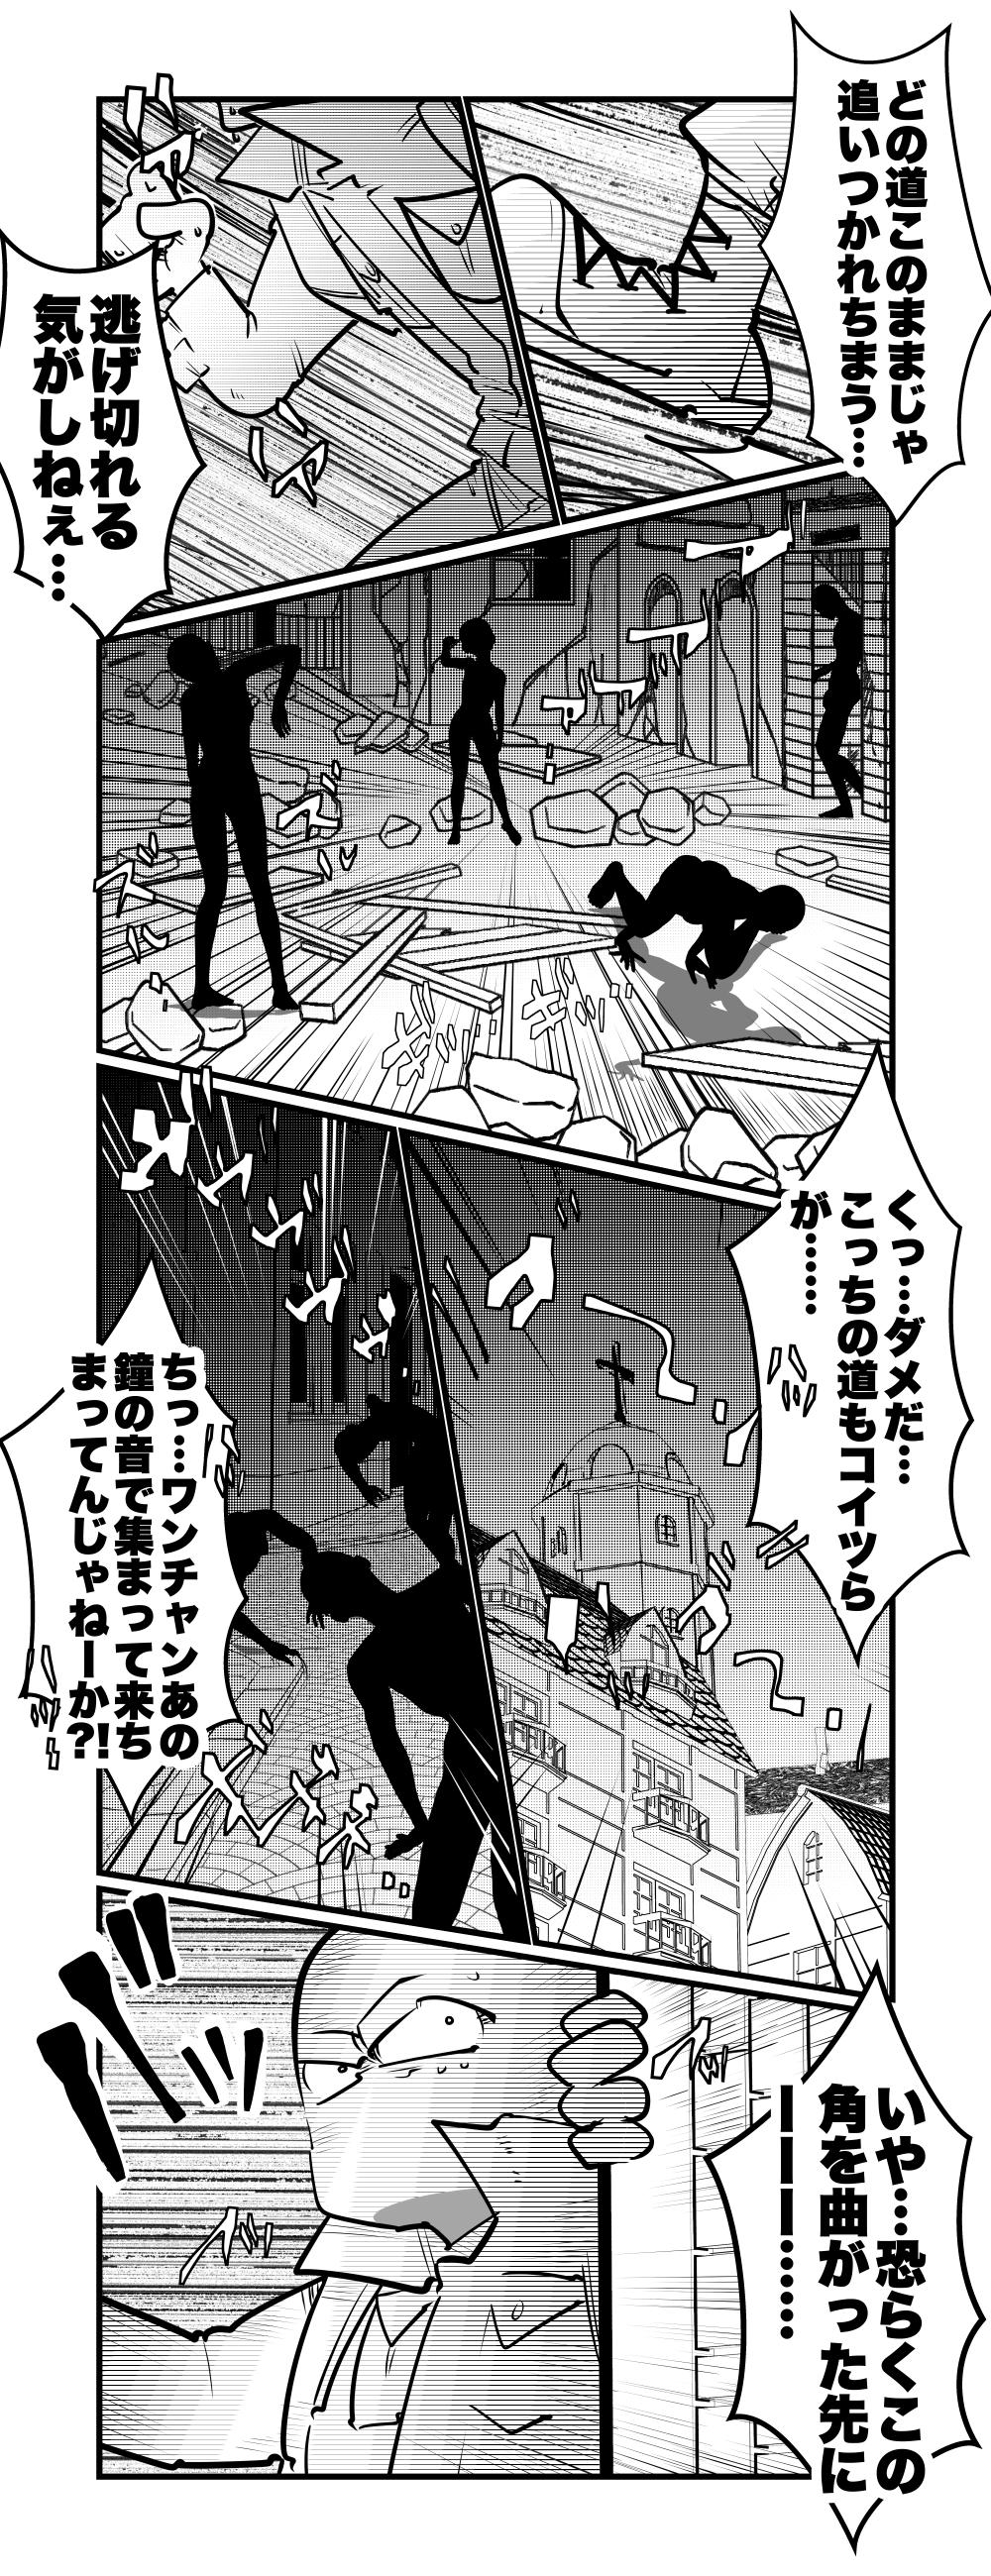 f:id:terashimaru117:20210915010932p:plain